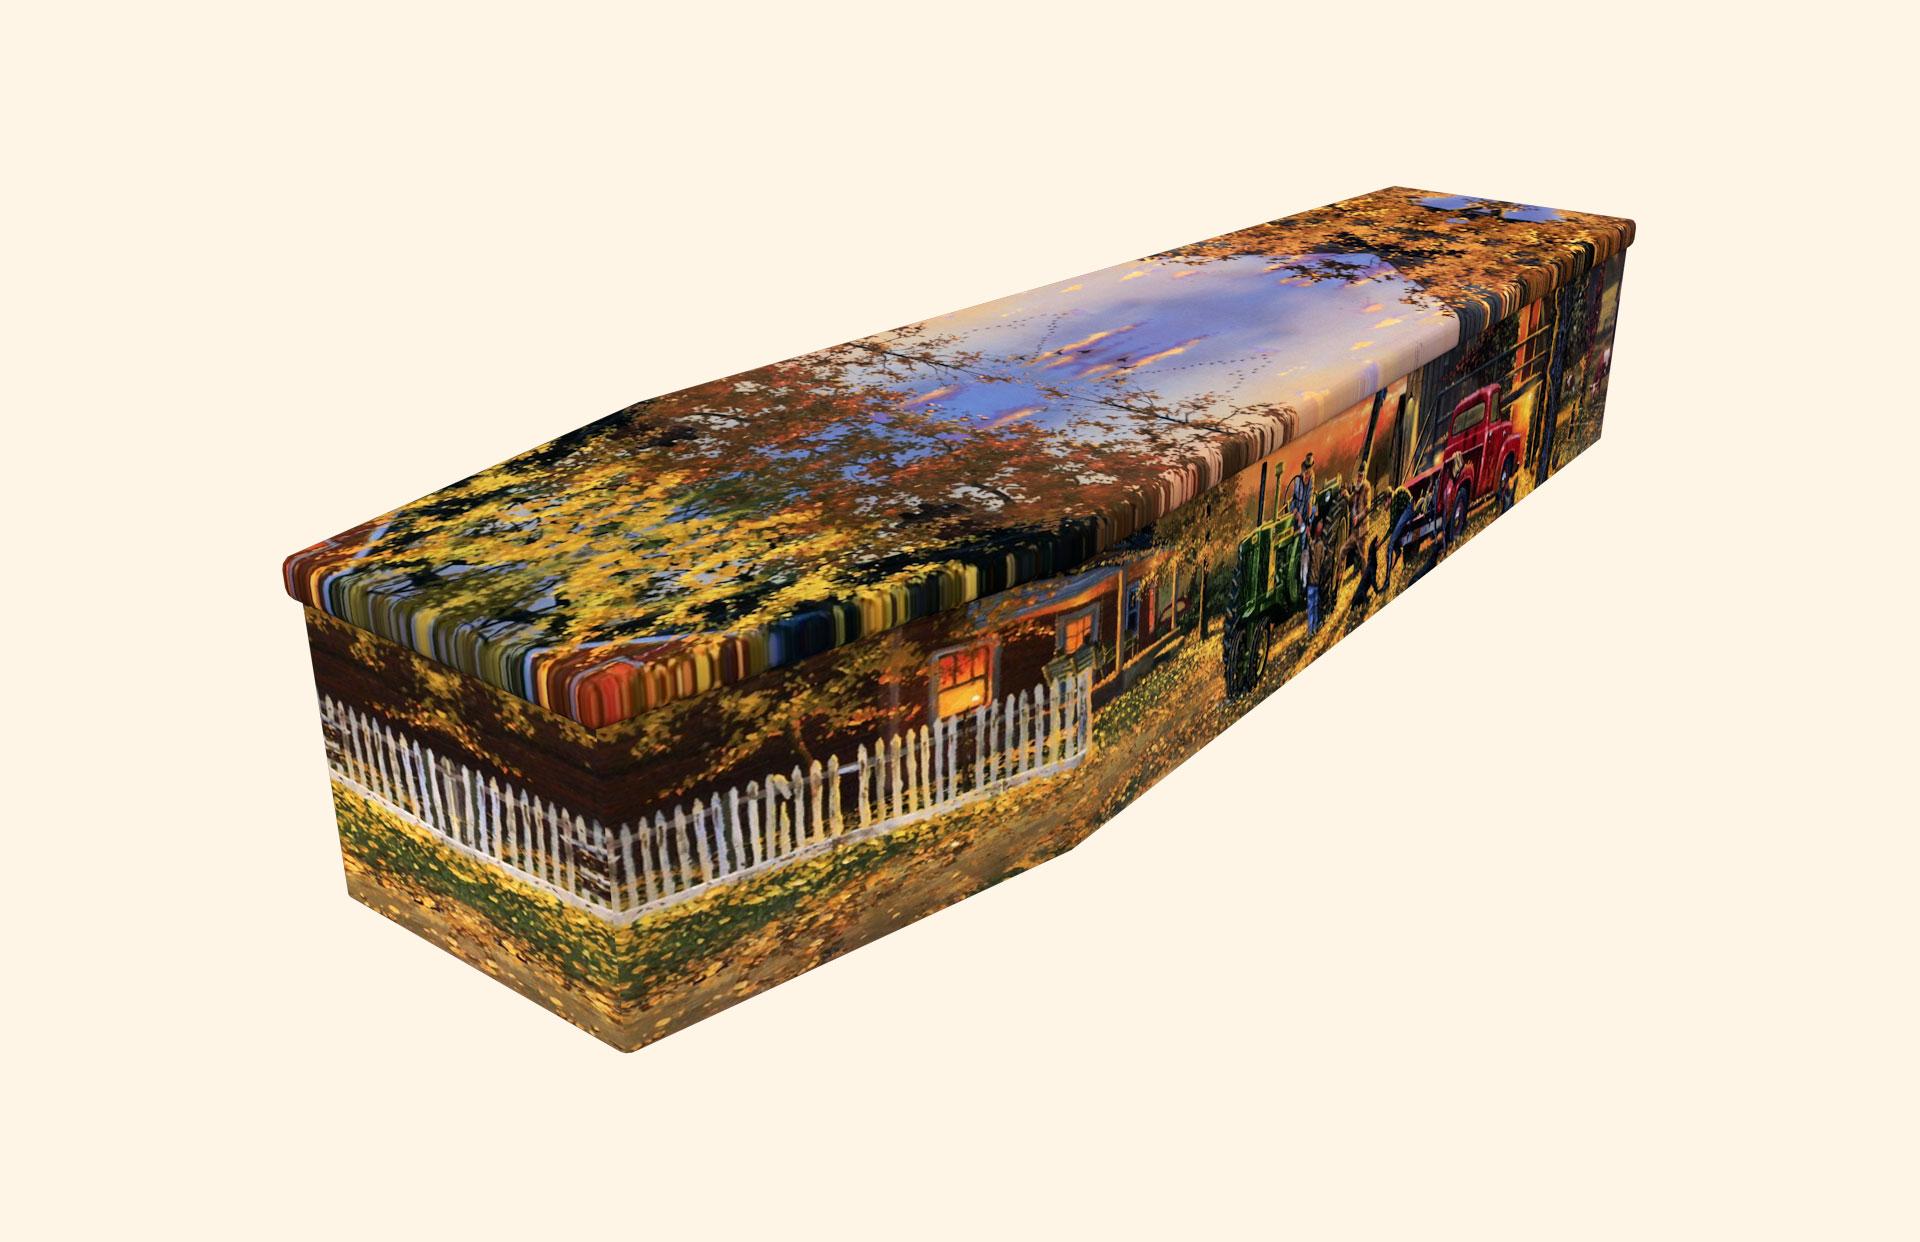 Farm Life Cardboard coffin